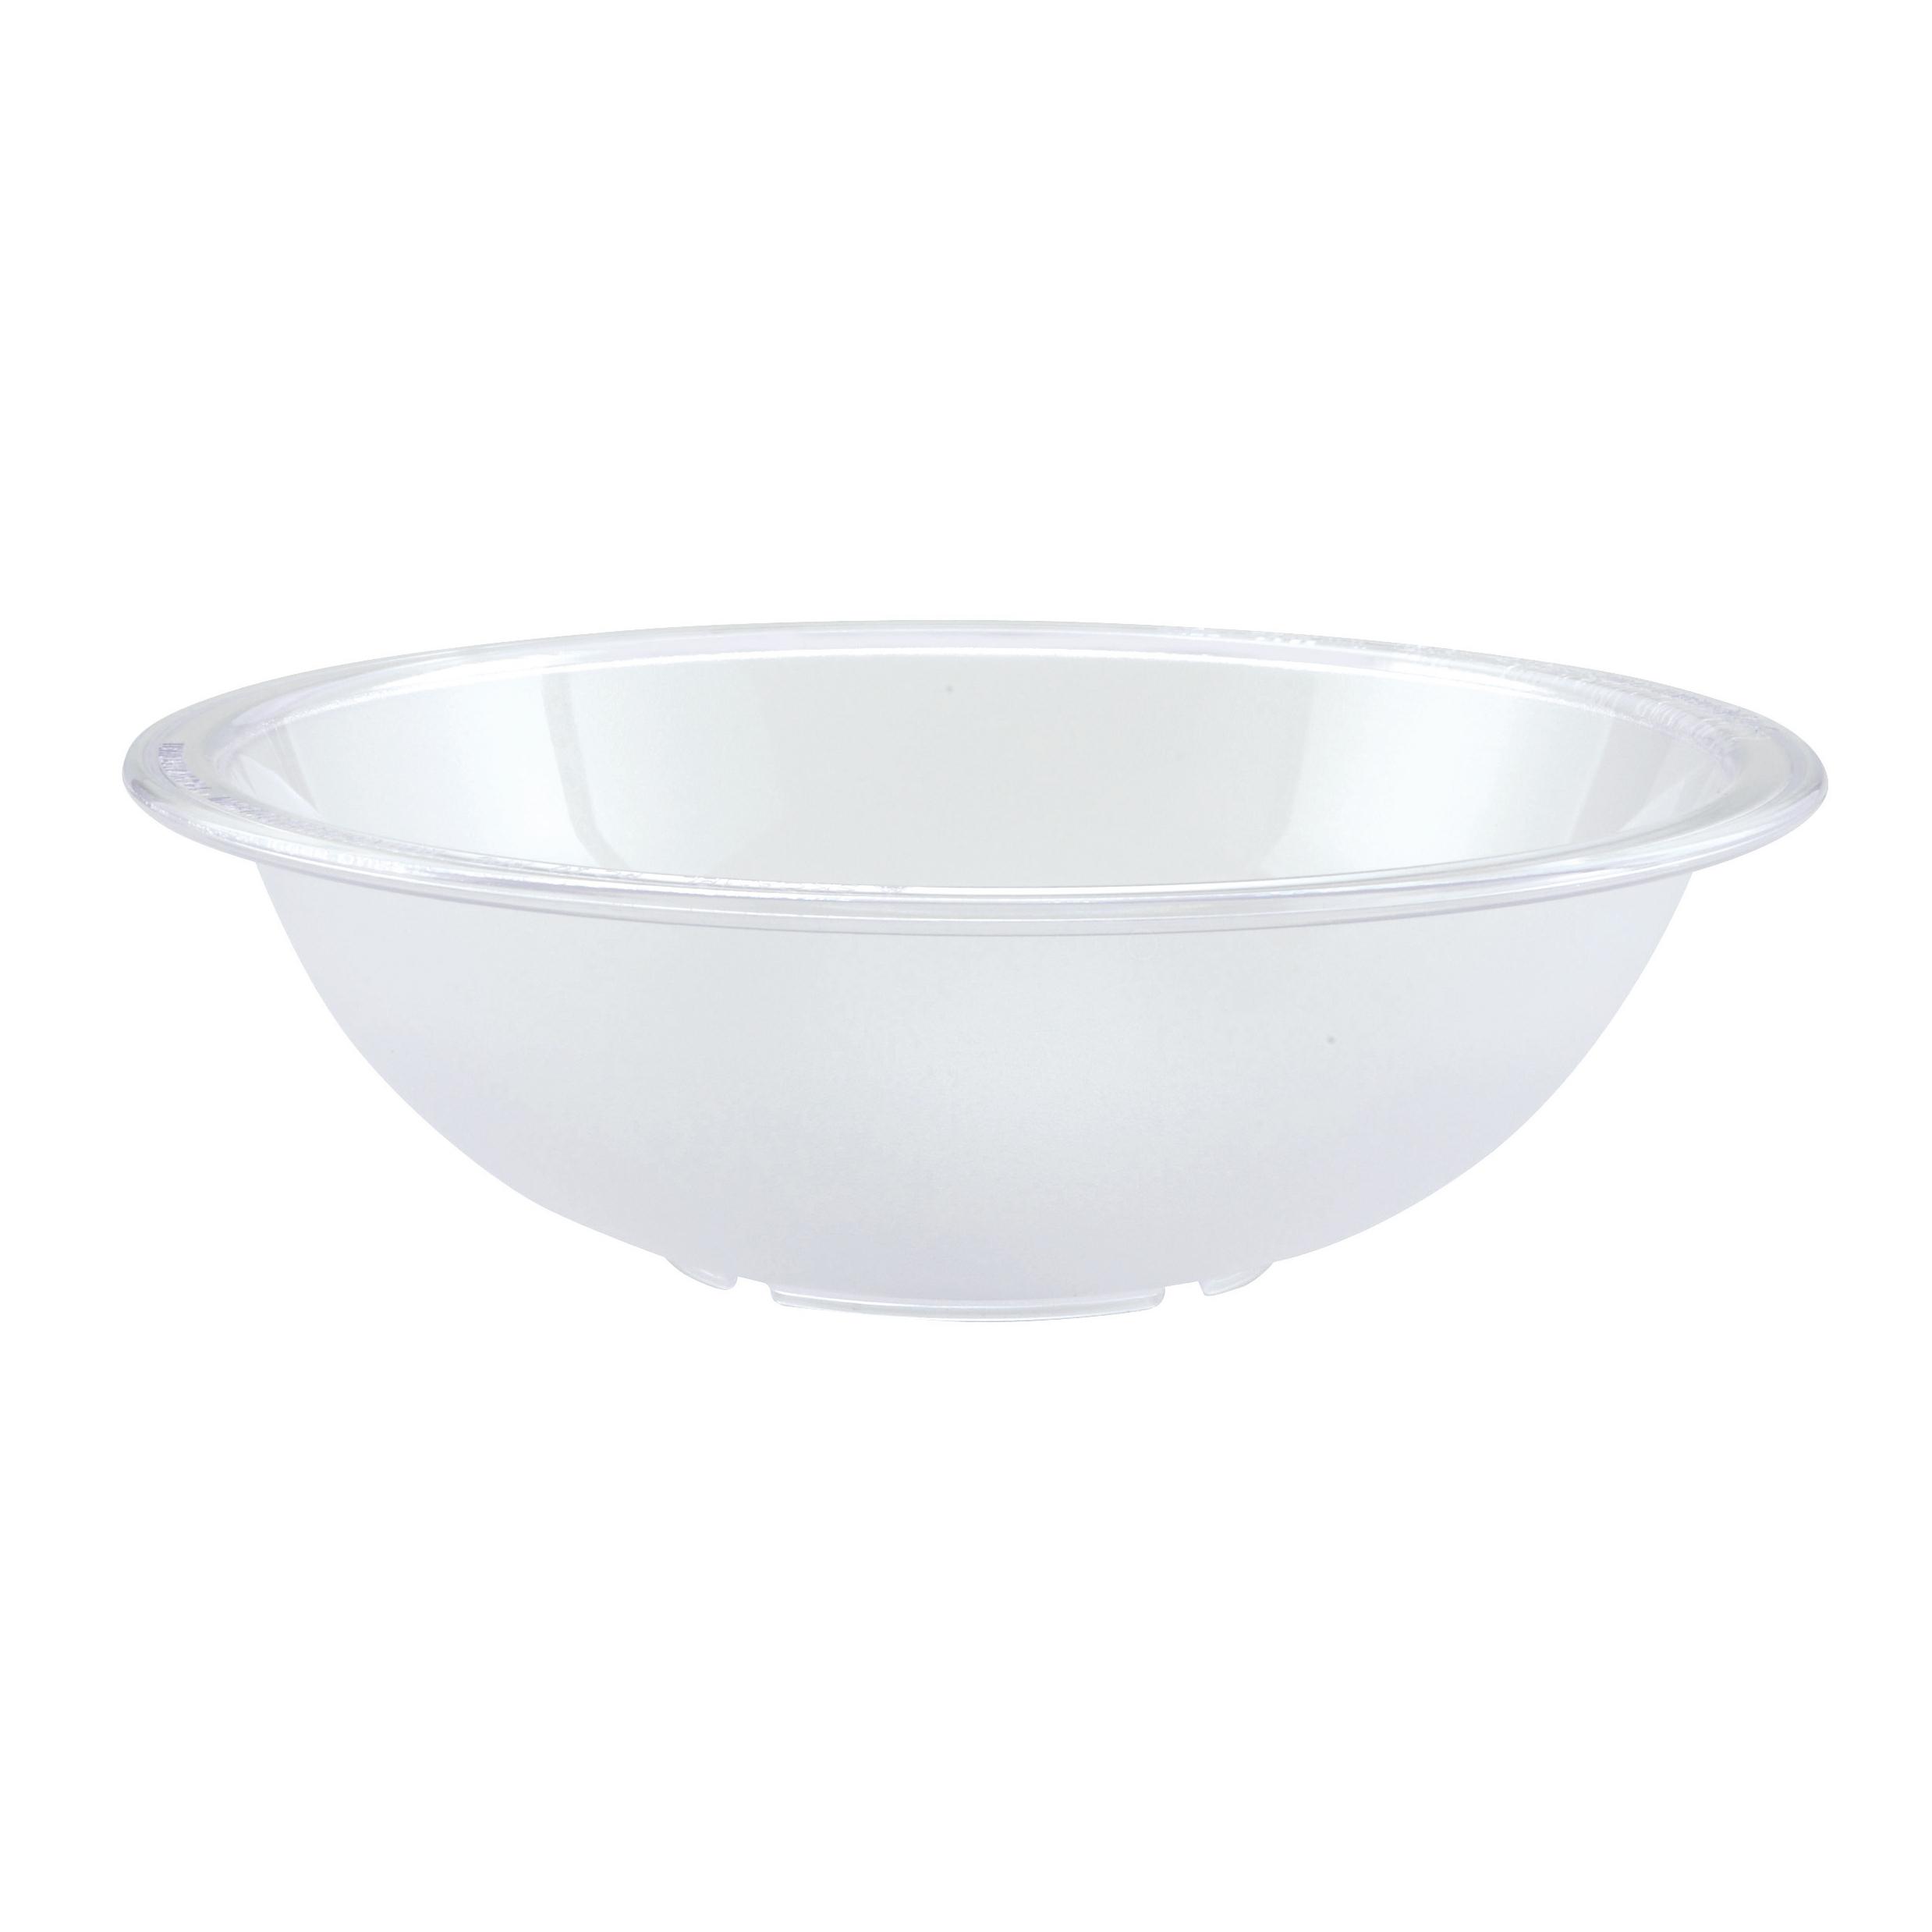 Winco PBB-12 soup salad pasta cereal bowl, plastic